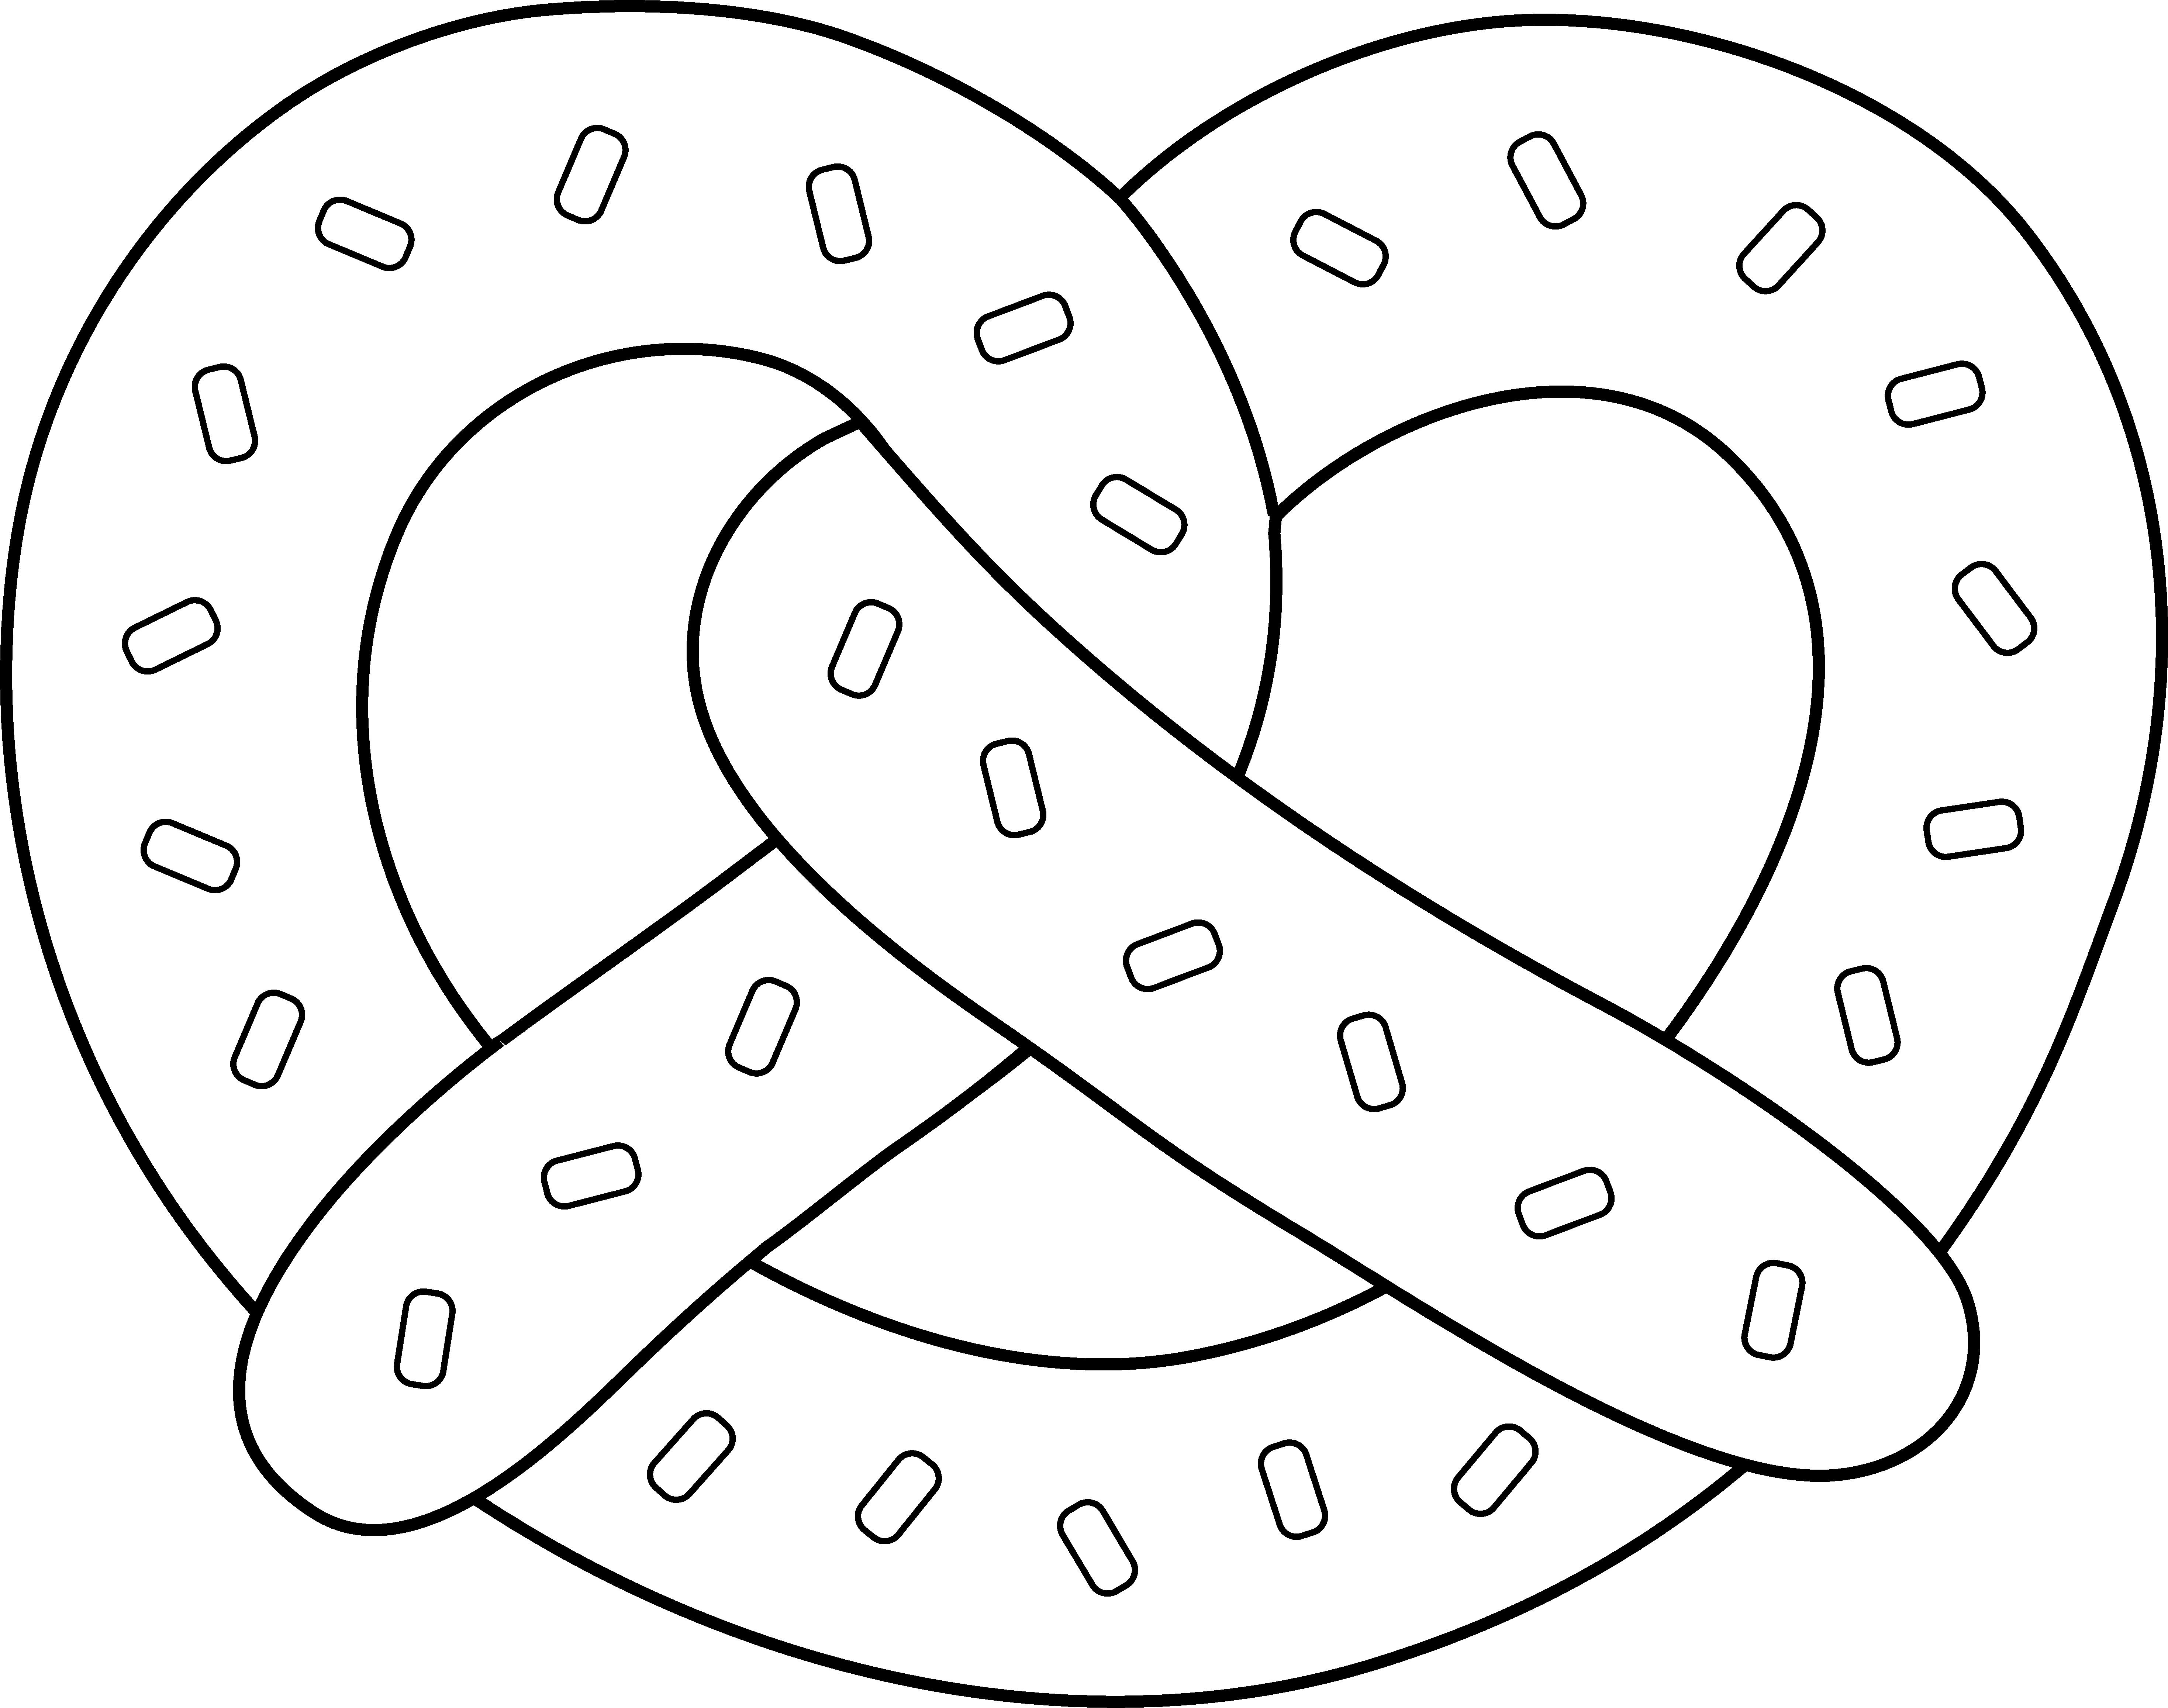 Free Pretzel Clipart Black And White, Download Free Clip Art.